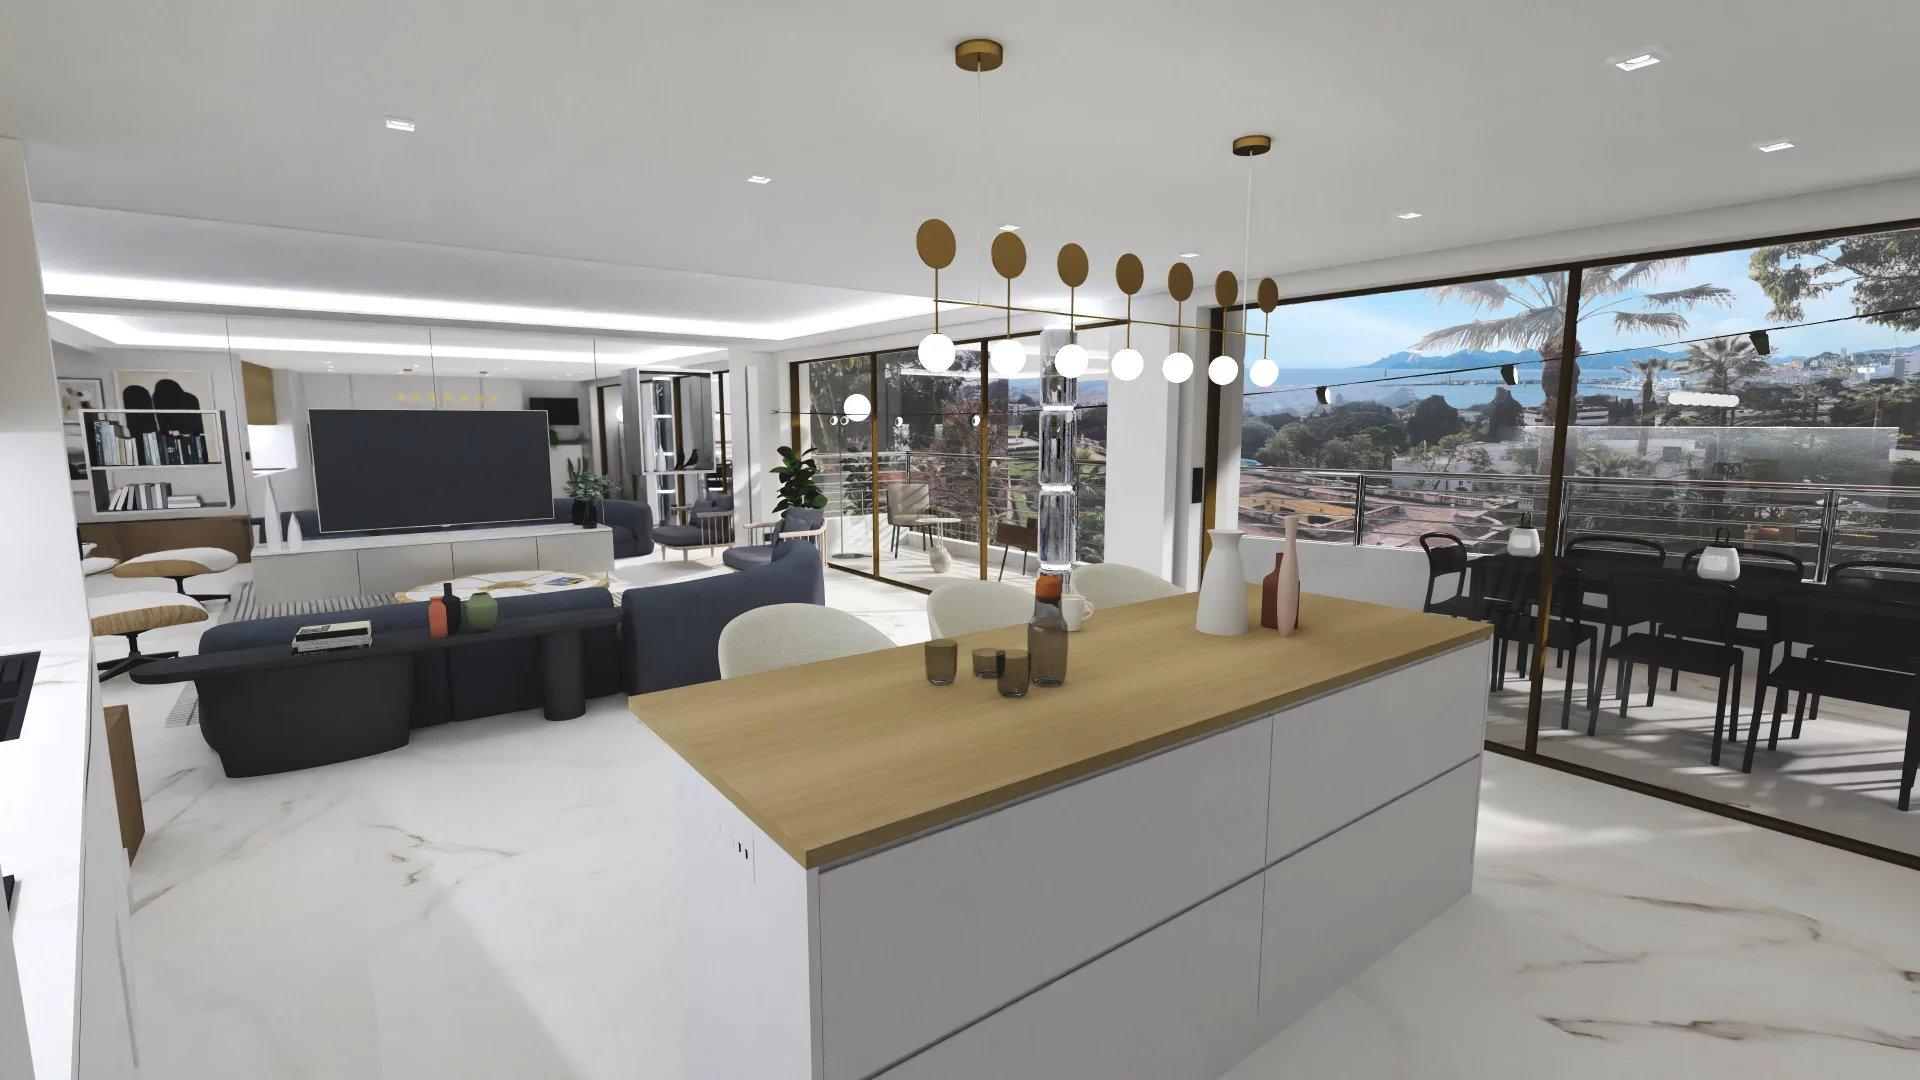 CANNES - VENTE APPARTEMENT 4P 128M² + 46M² Terrasses VUE MER PANORAMIQUE